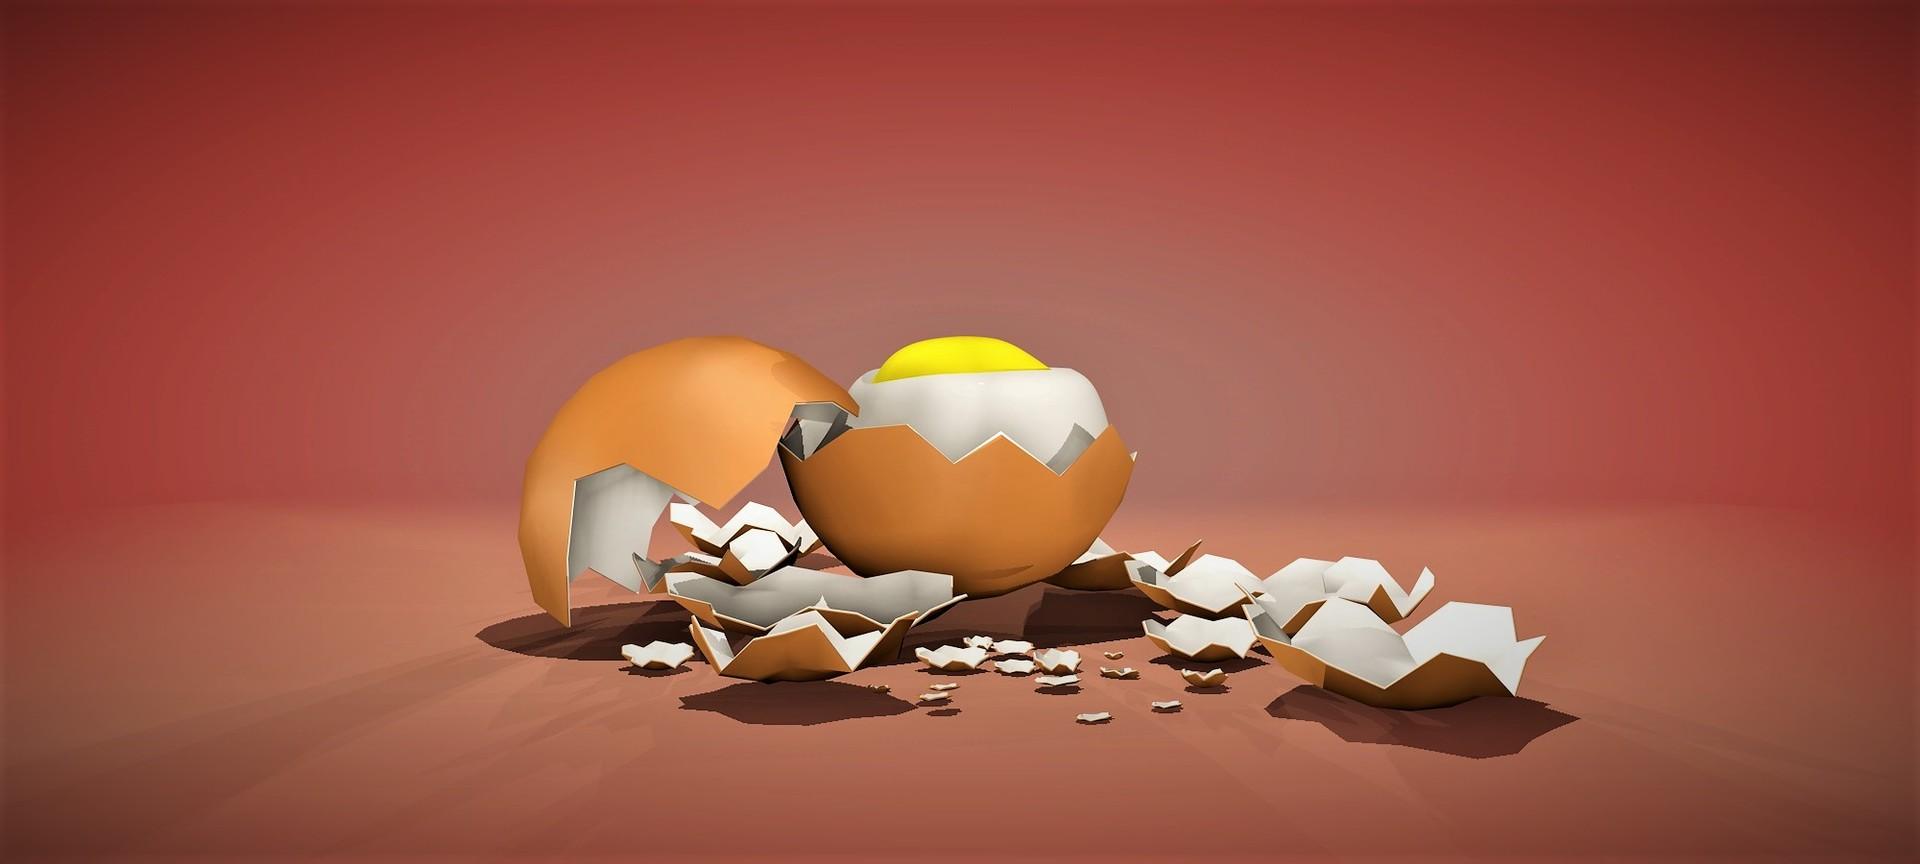 Viviana alvarado huevos